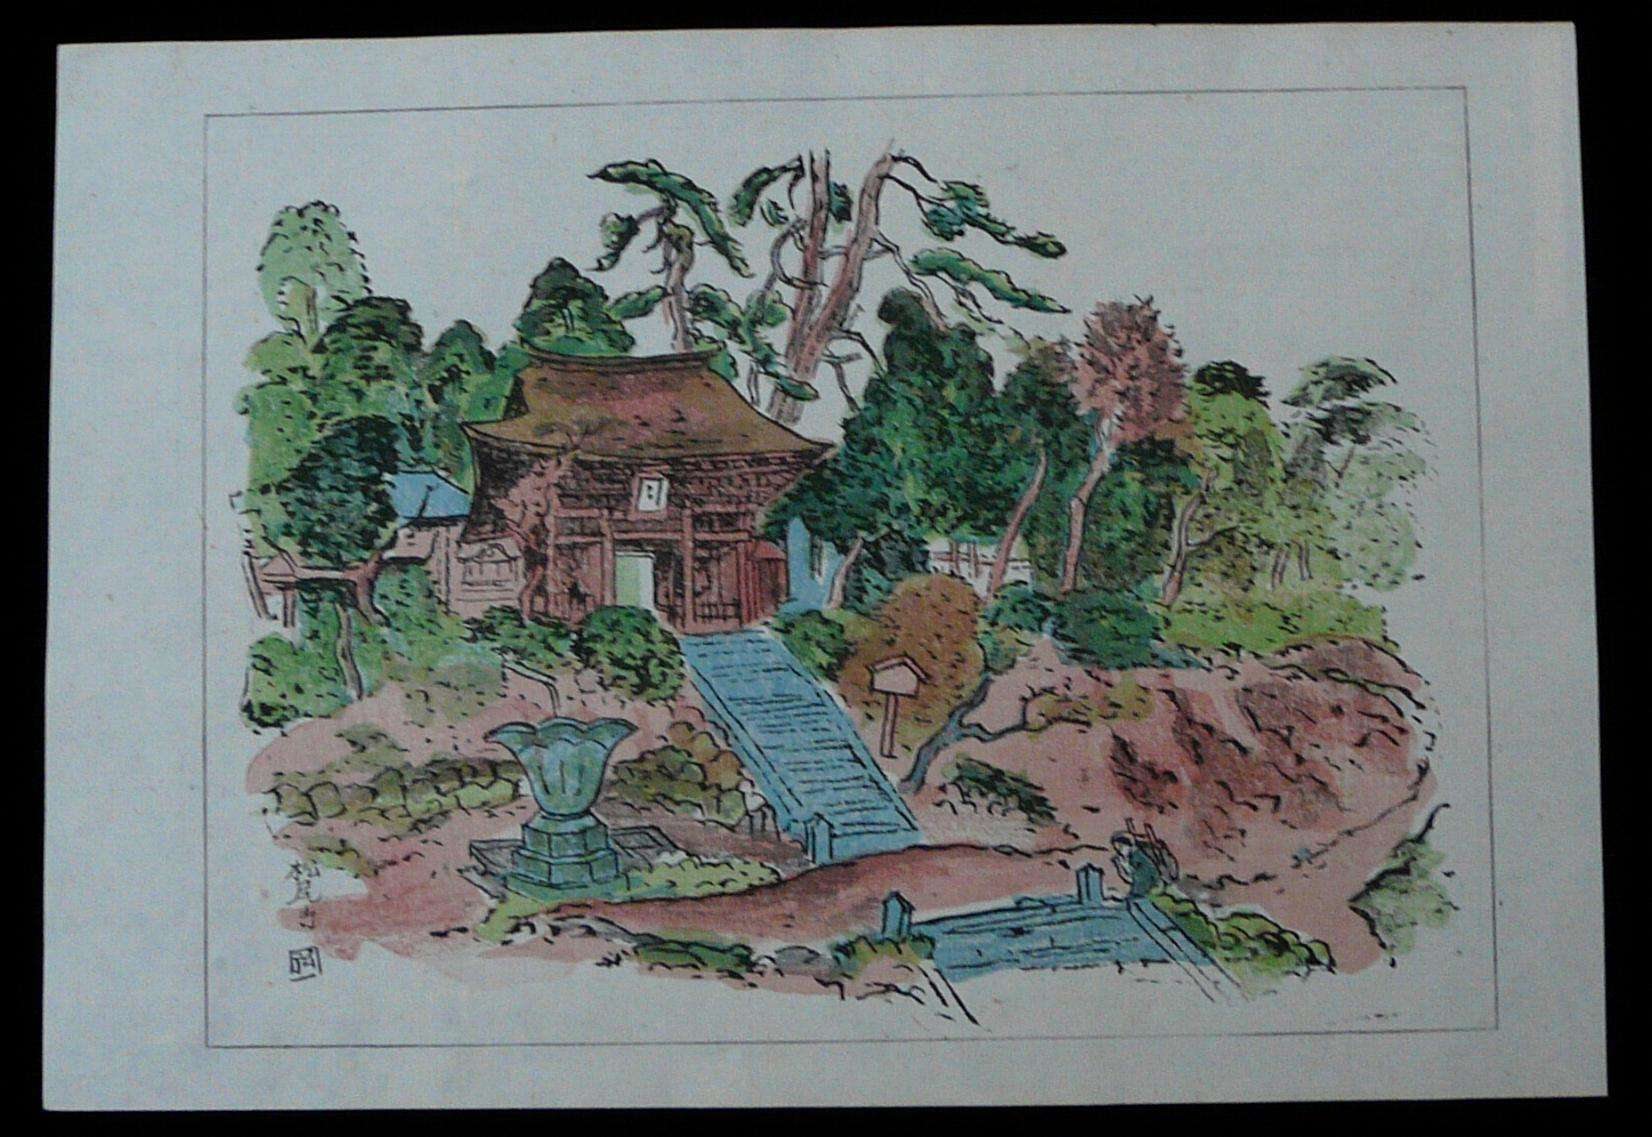 HIROMITSU NAKAZAWA: #P2931 ORIGINAL FIRST EDITION JAPANESE WOODBLOCK PRINT